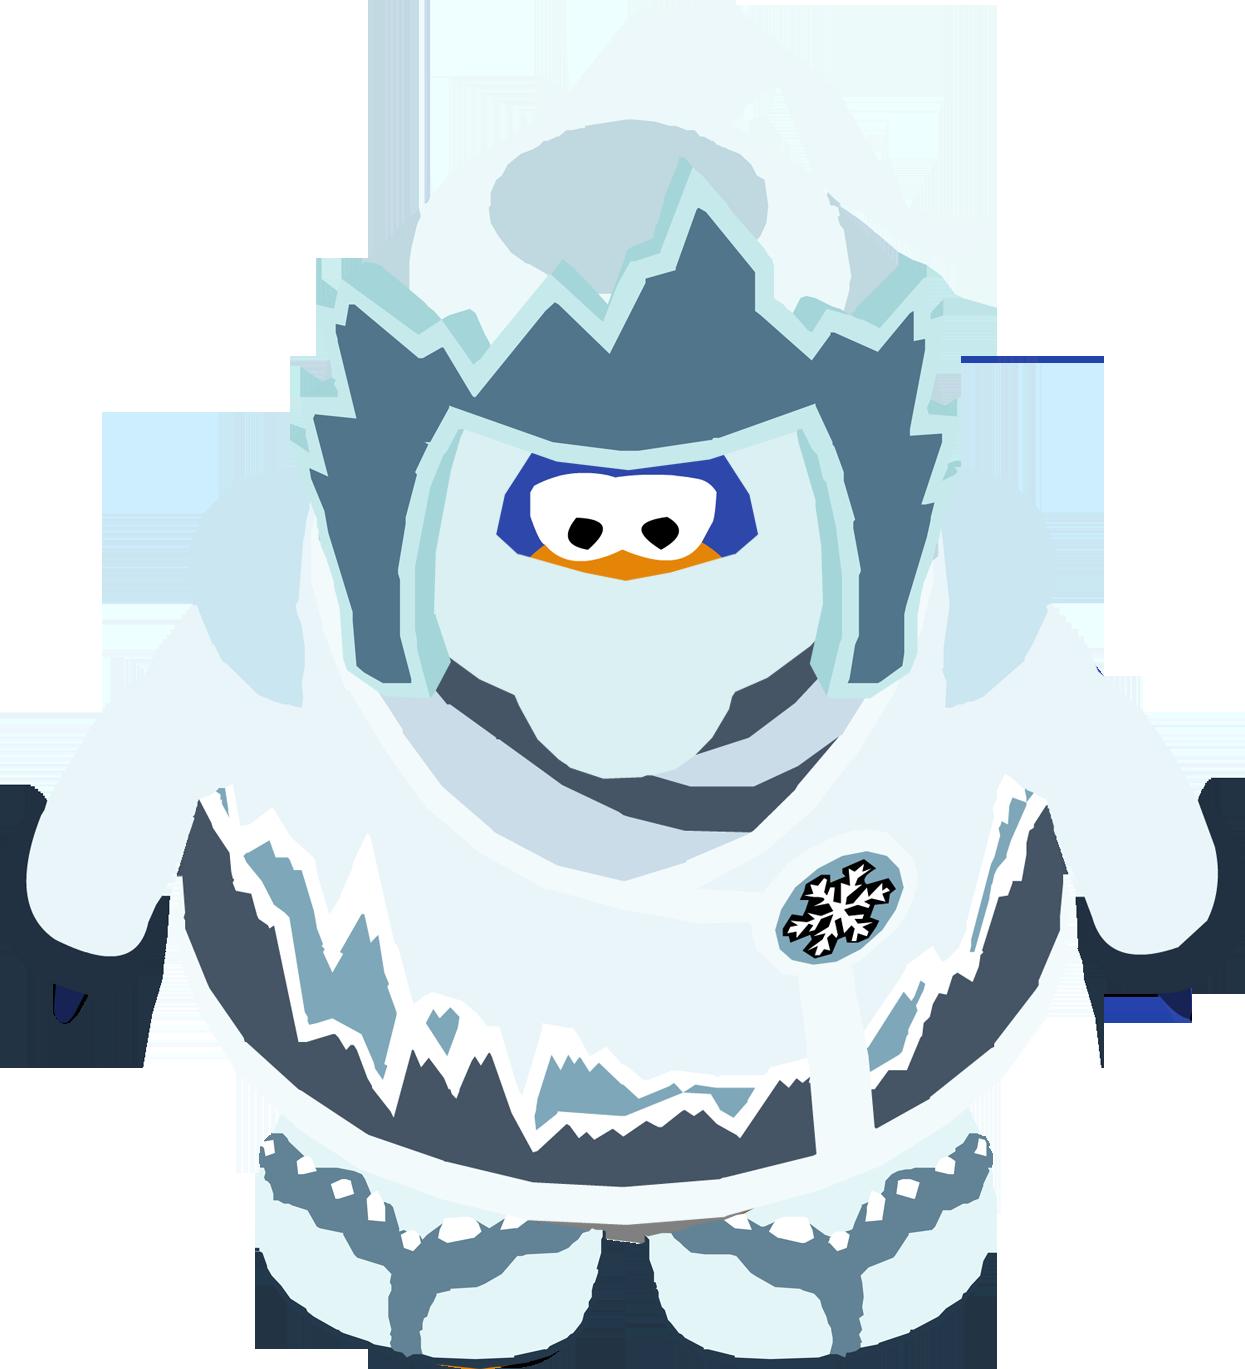 Floor clipart snowy. Snow ninja club penguin